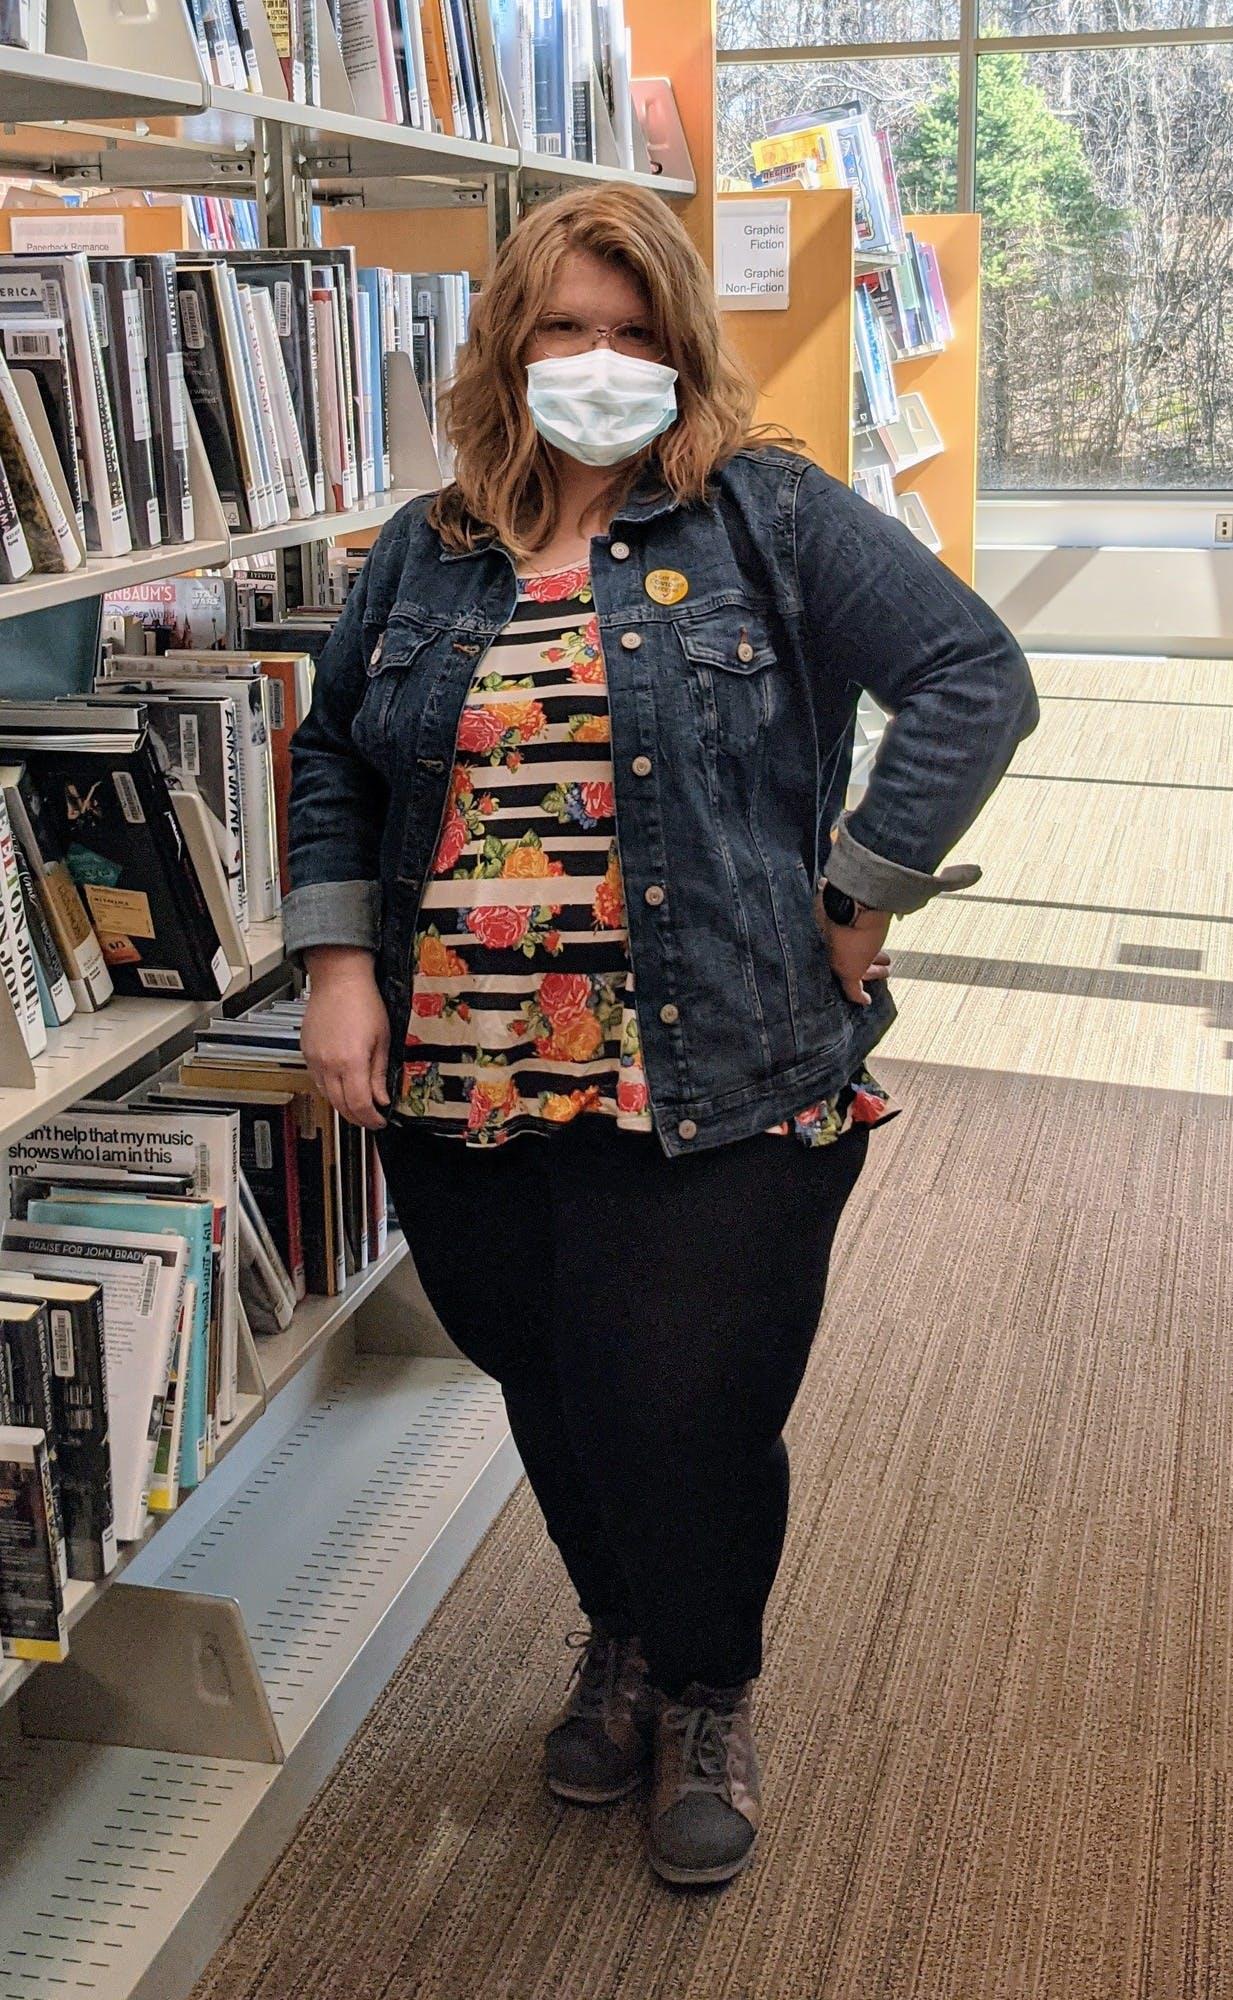 The pandemic inspired librarian Deborah Bifulk to adopt a new workwear 'uniform' of leggings and tunics.